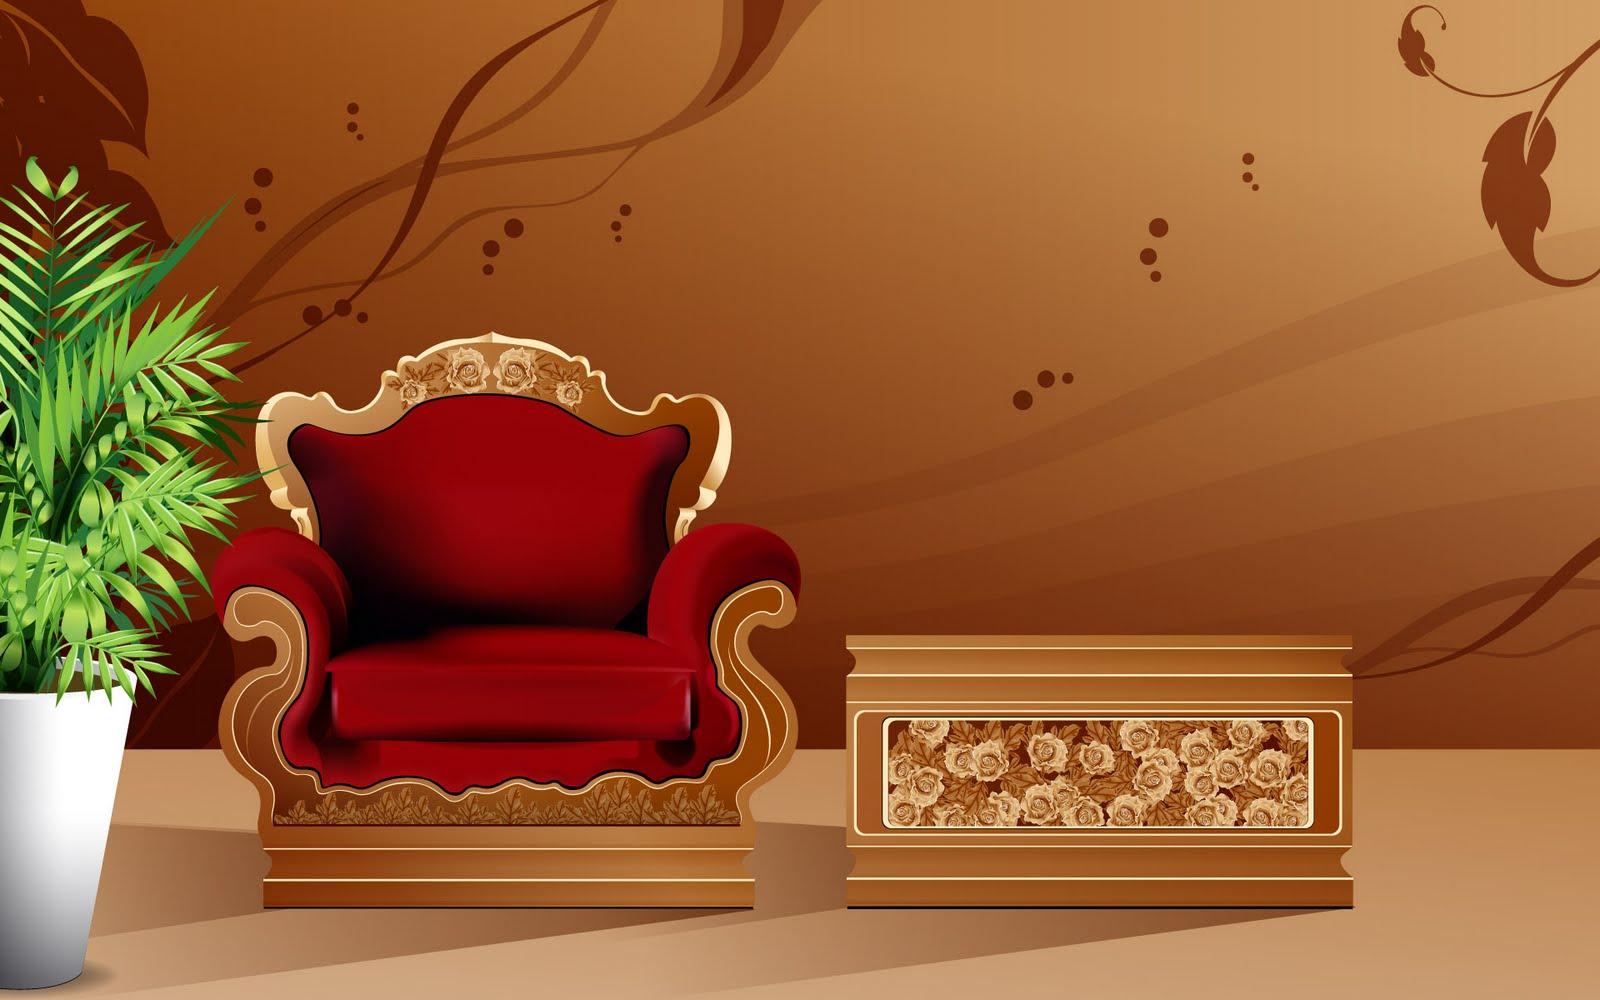 Home Interior Pictures Digital art interior design wallpapers 11 1600x1000